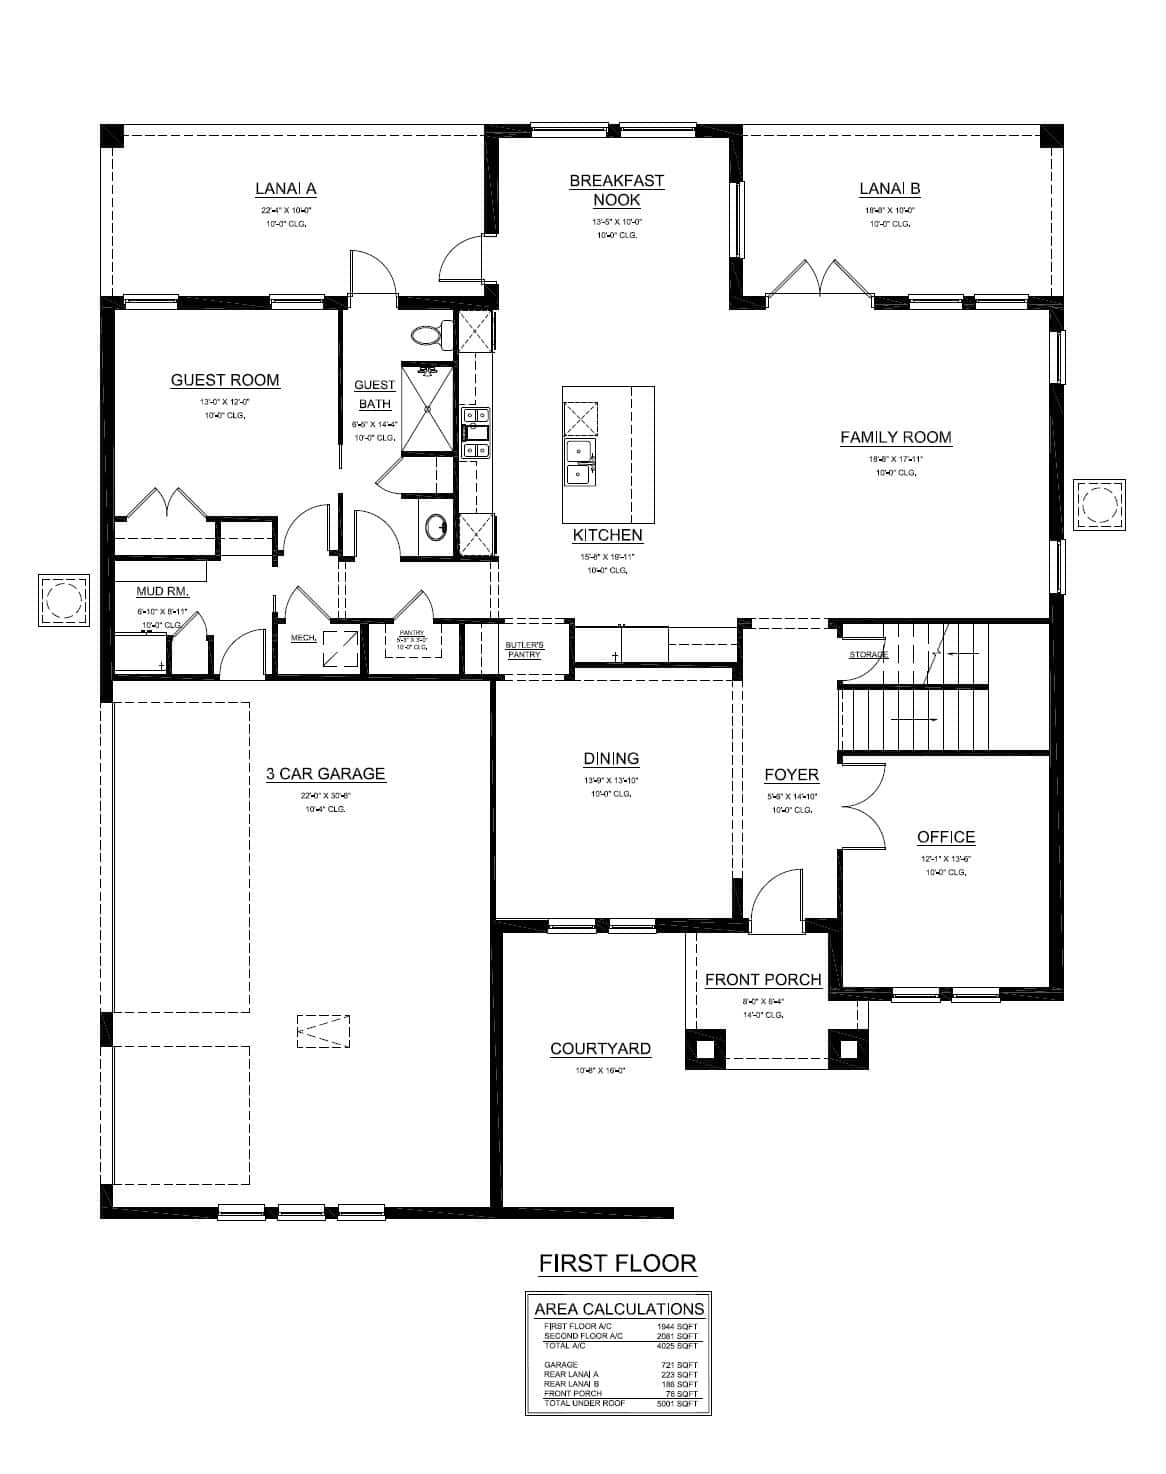 St george turain signature homes for Signature home designs